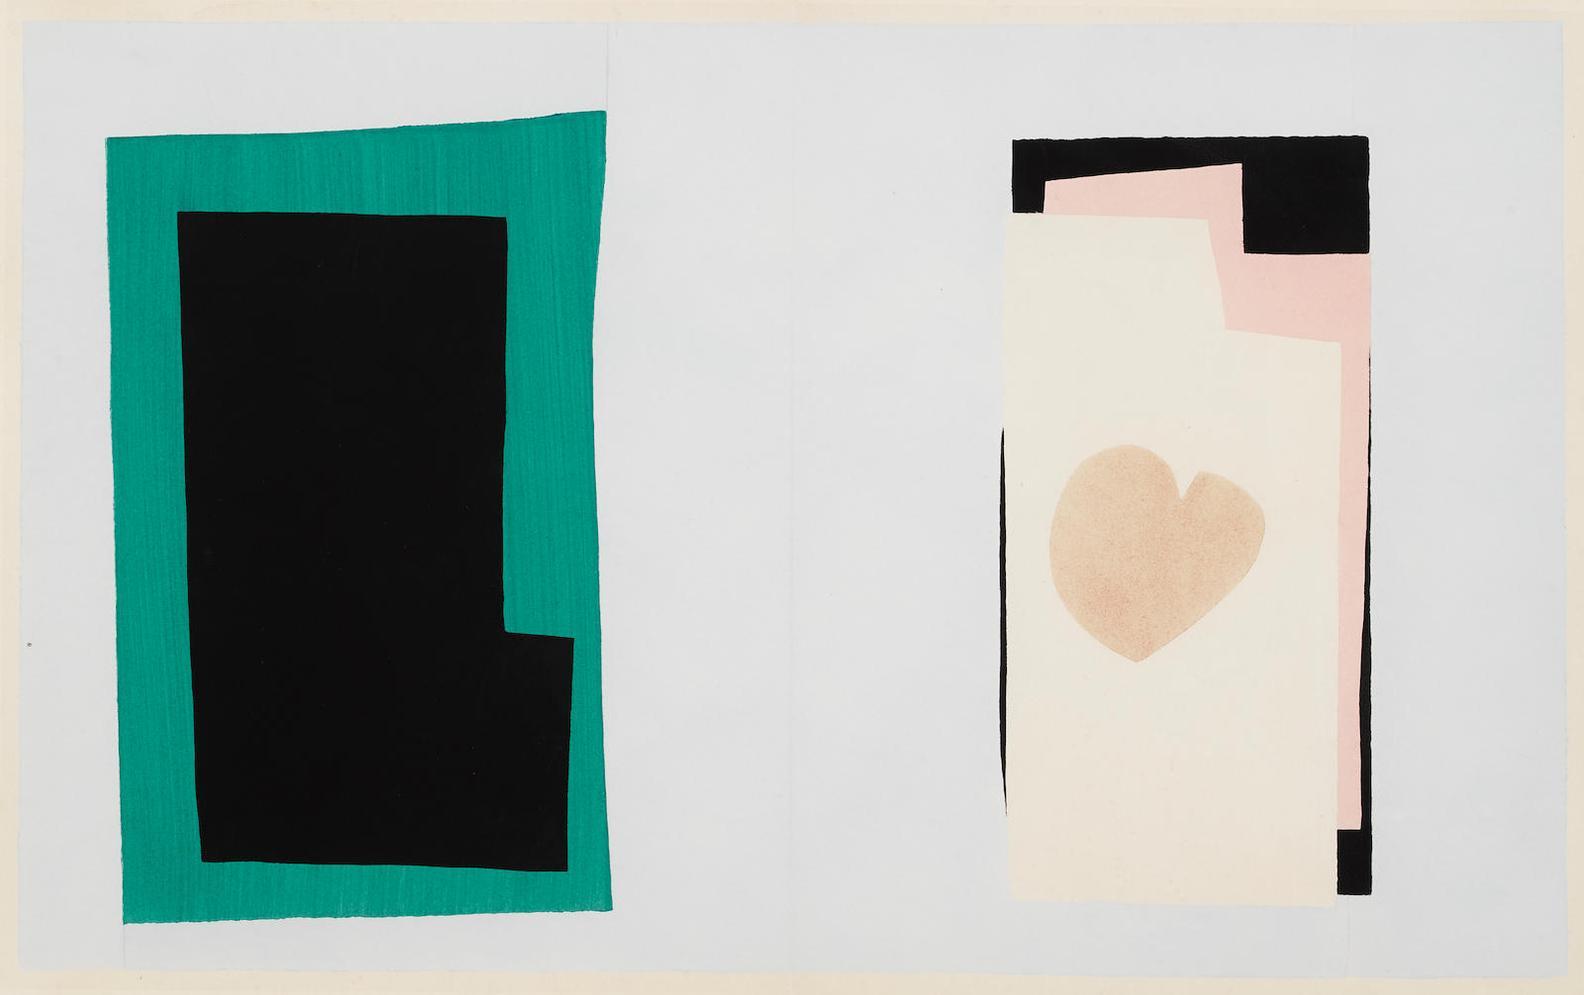 Henri Matisse-Le Coeur, Pl. VII, From Jazz-1947